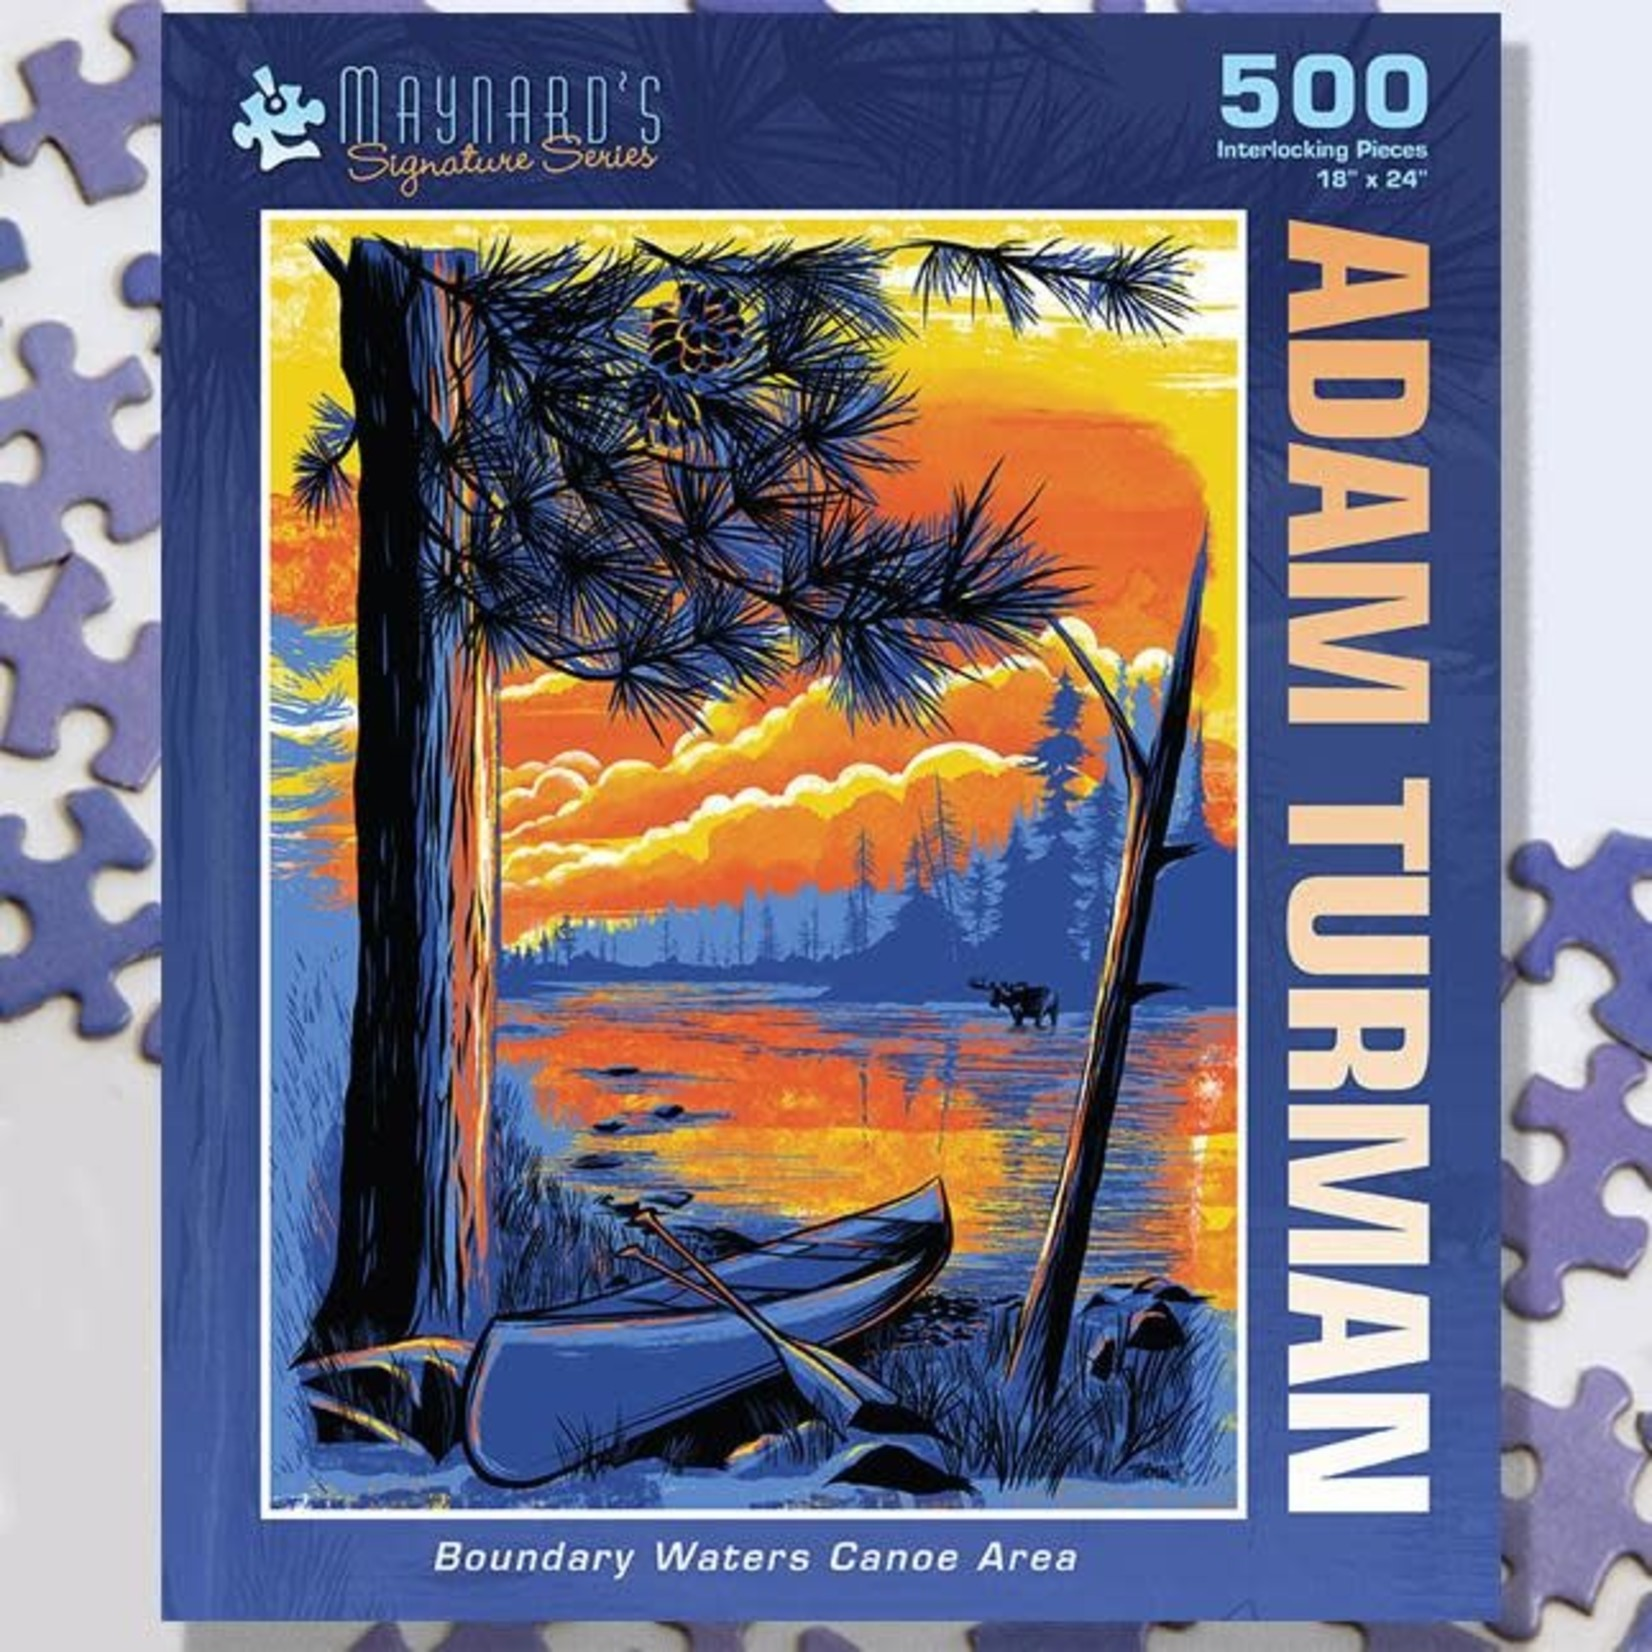 Puzzle Twist Maynard's Signature Series - 500 Piece Puzzle: Boundary Waters Canoe Area